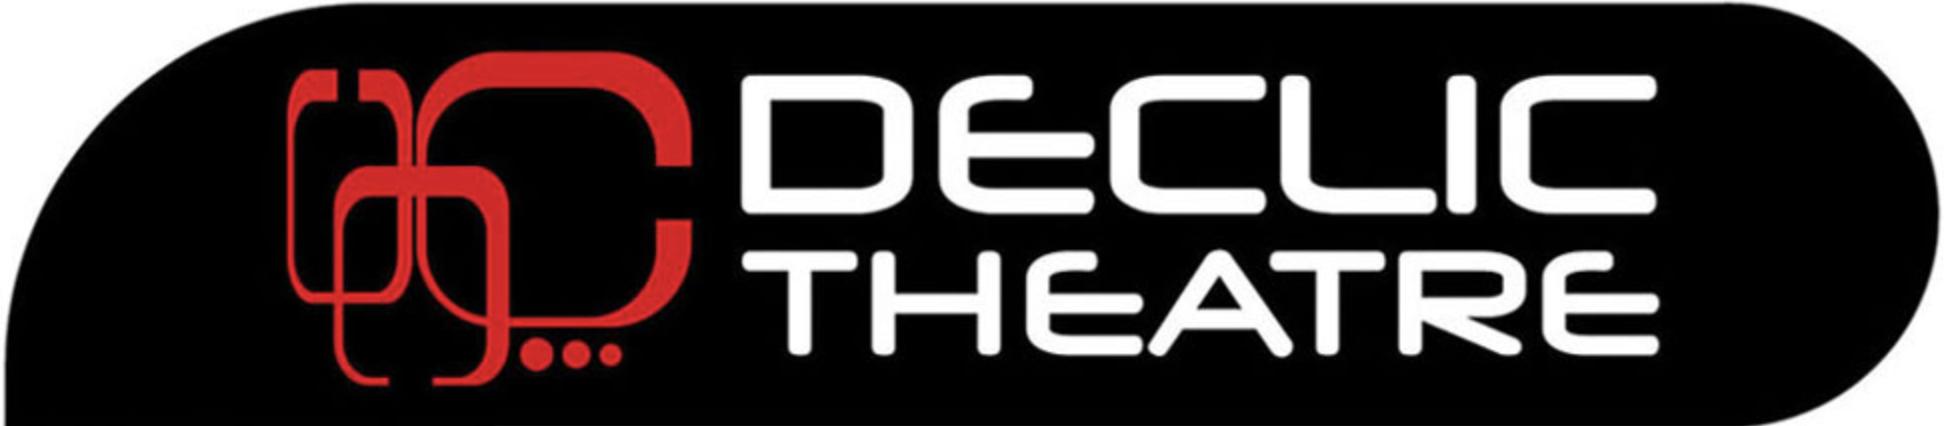 Webassoc.fr avec Déclic Théâtre